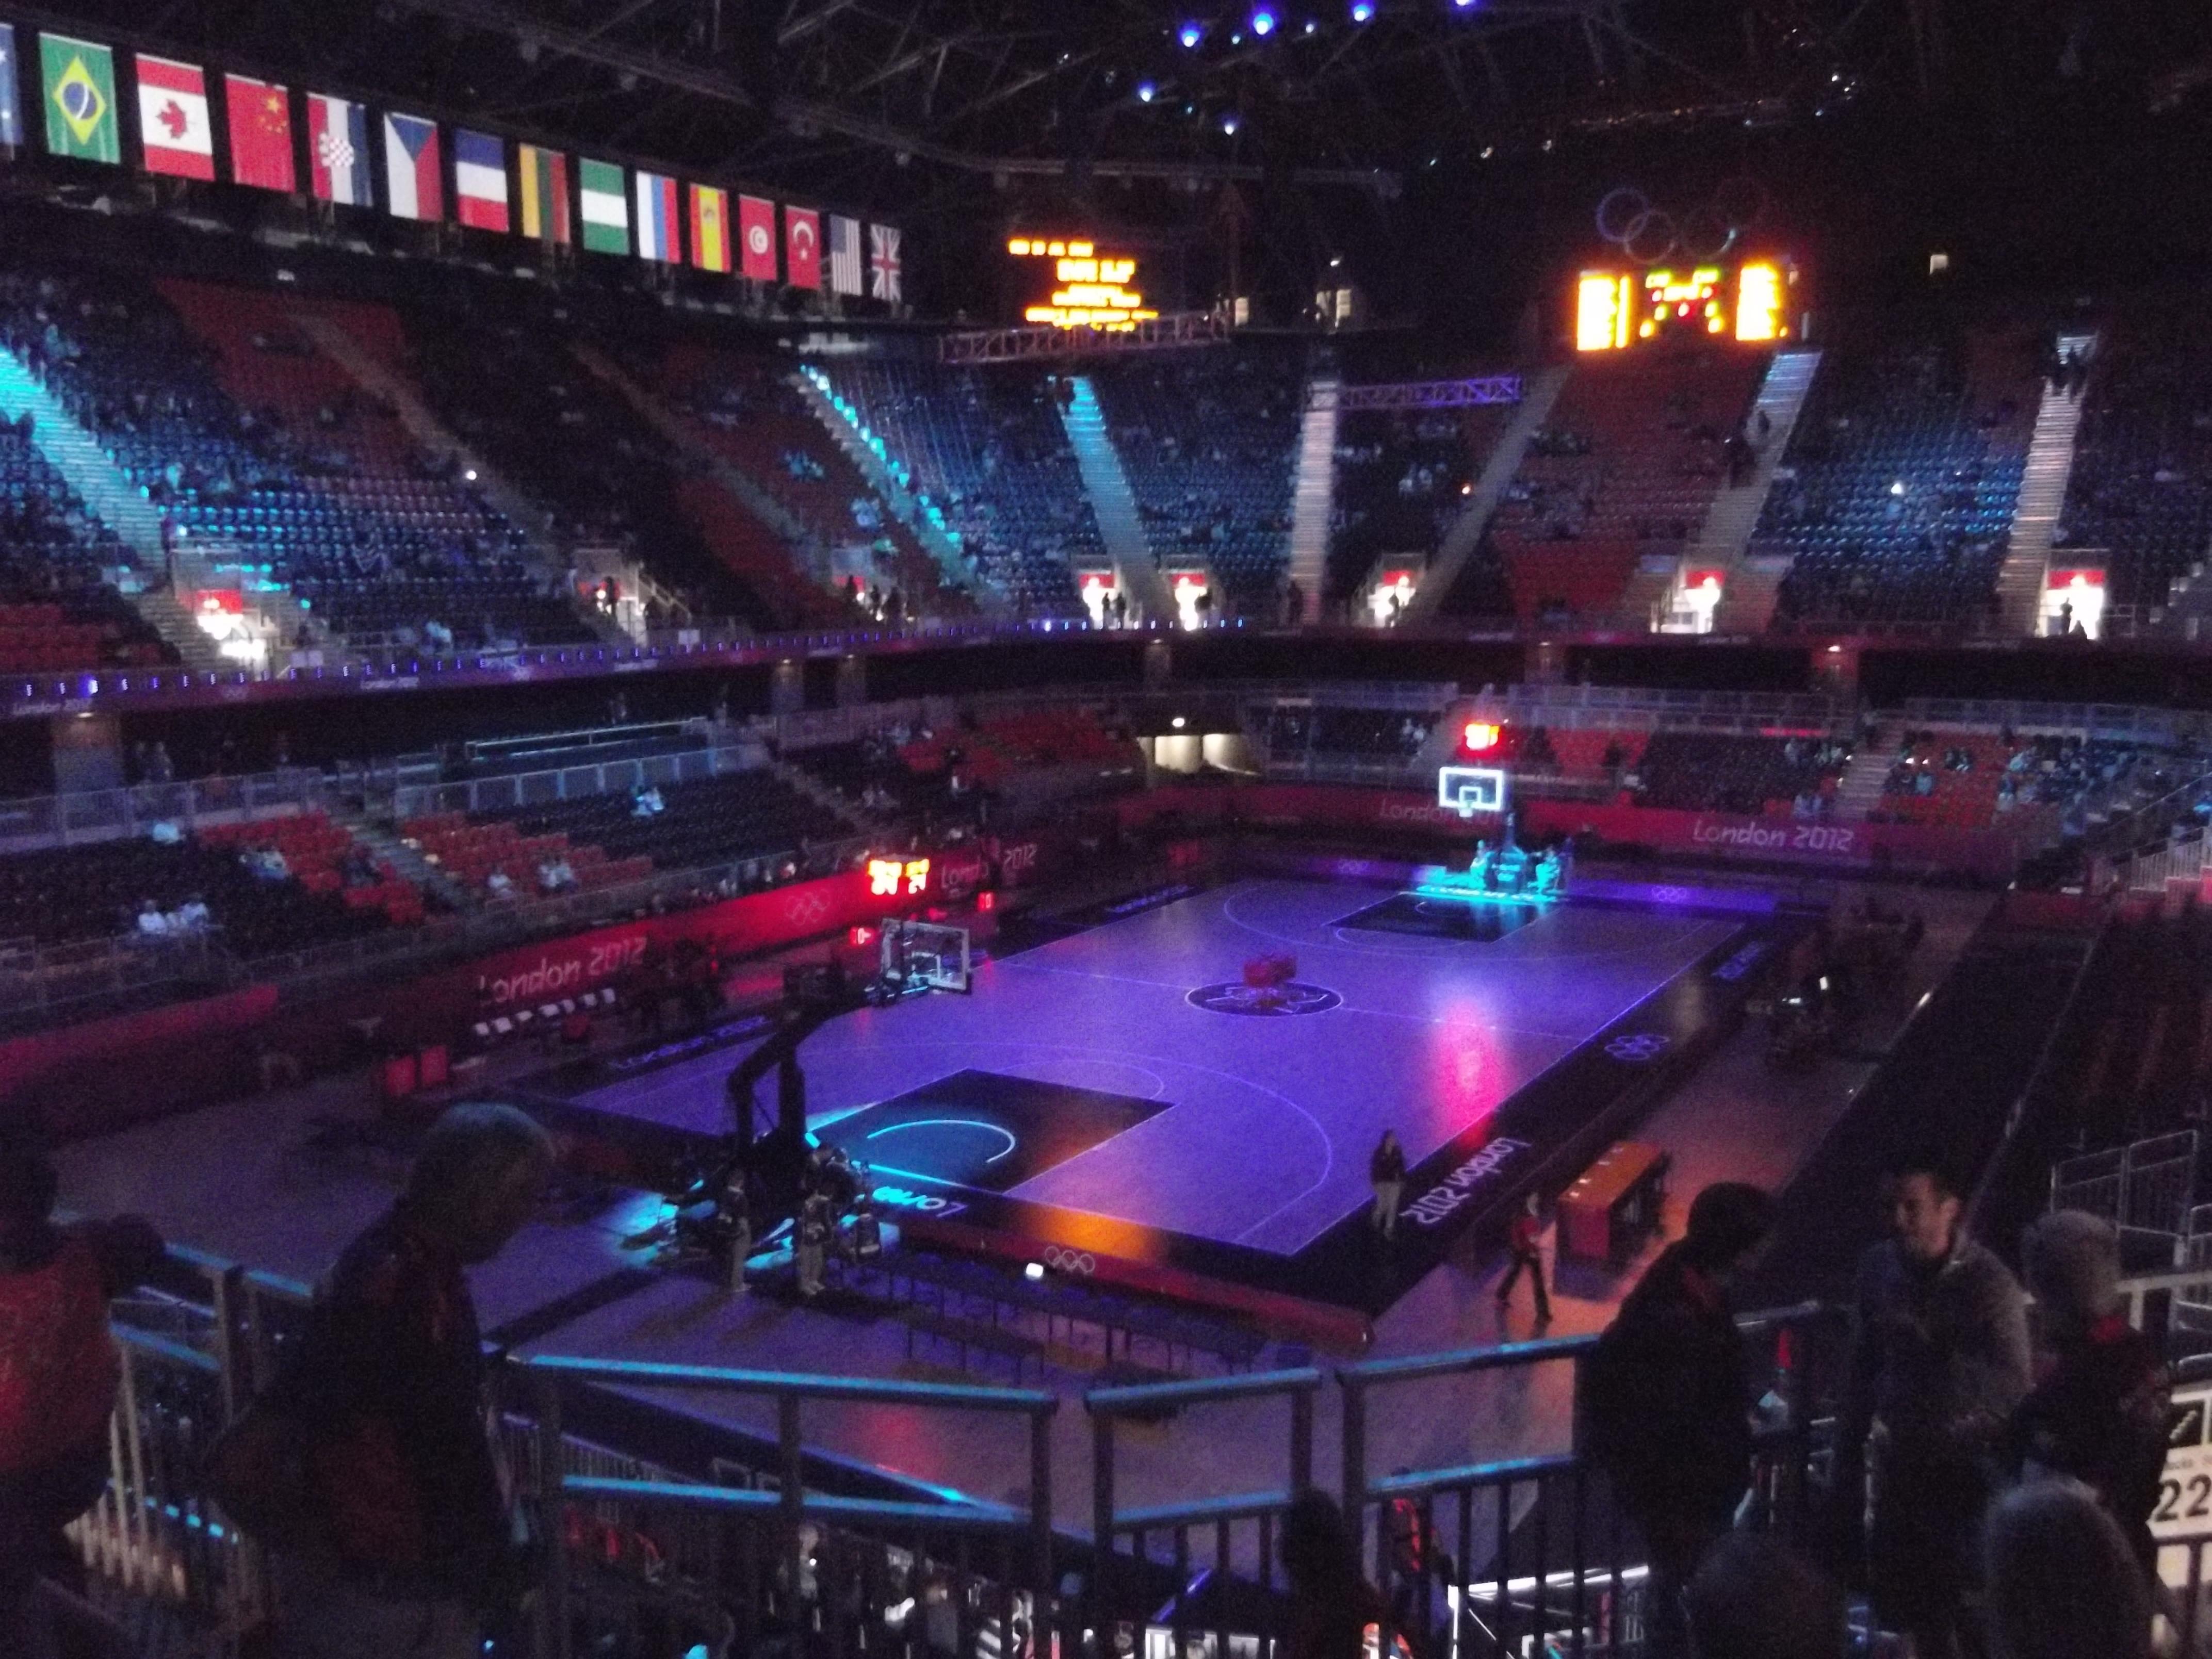 filebasketball arena london 30 july 2012 4jpg